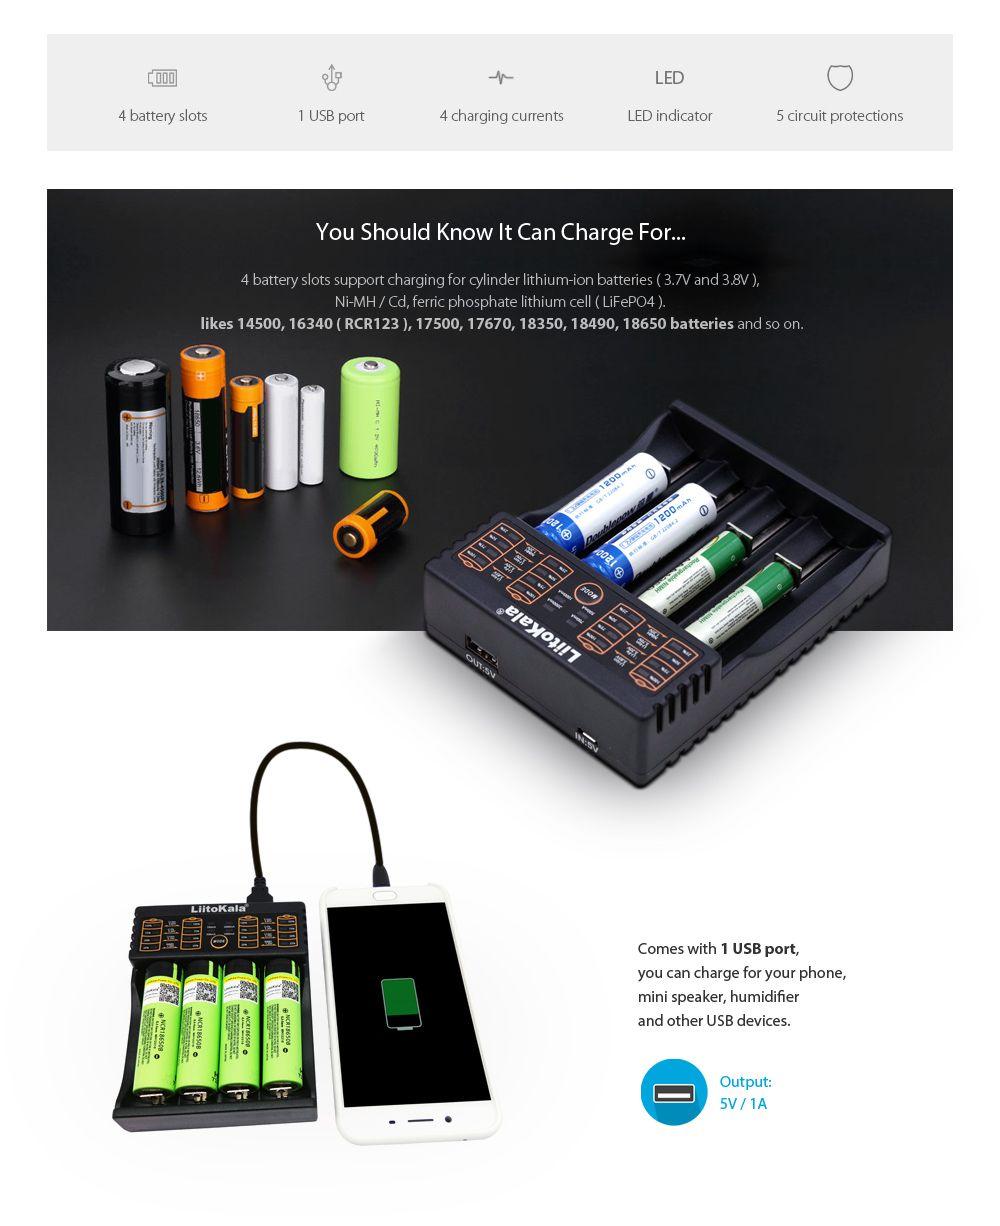 LiitoKala Lii - 402 Battery Charger for Li-ion / 18650 / 18490 / 18350 / 17670 / 17500 / 16340 ( RCR123 ) / 14500 / 10440